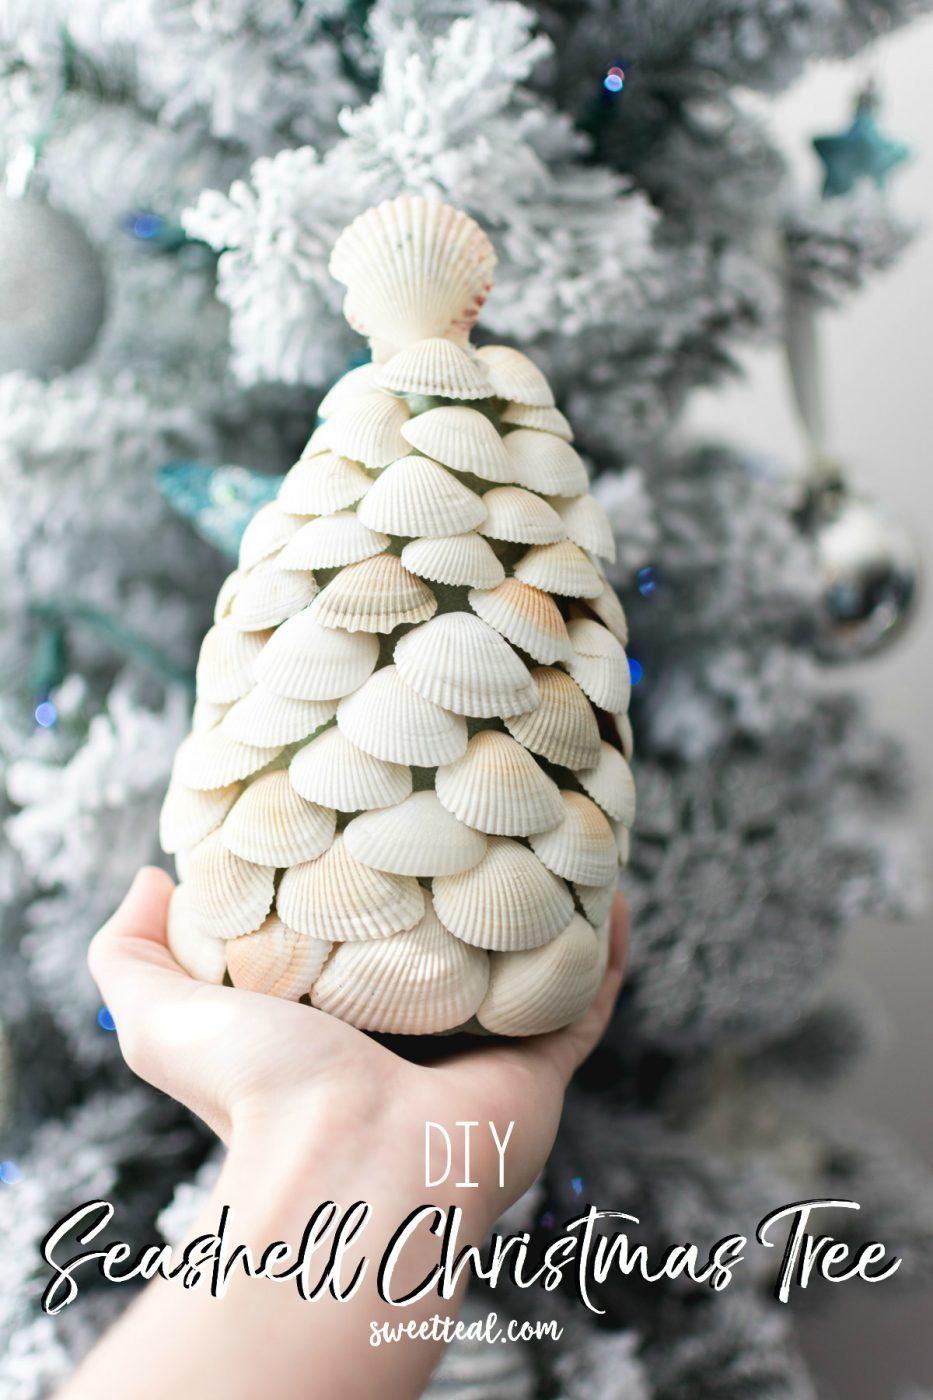 diy seashell christmas tree by Jenny - sweet teal